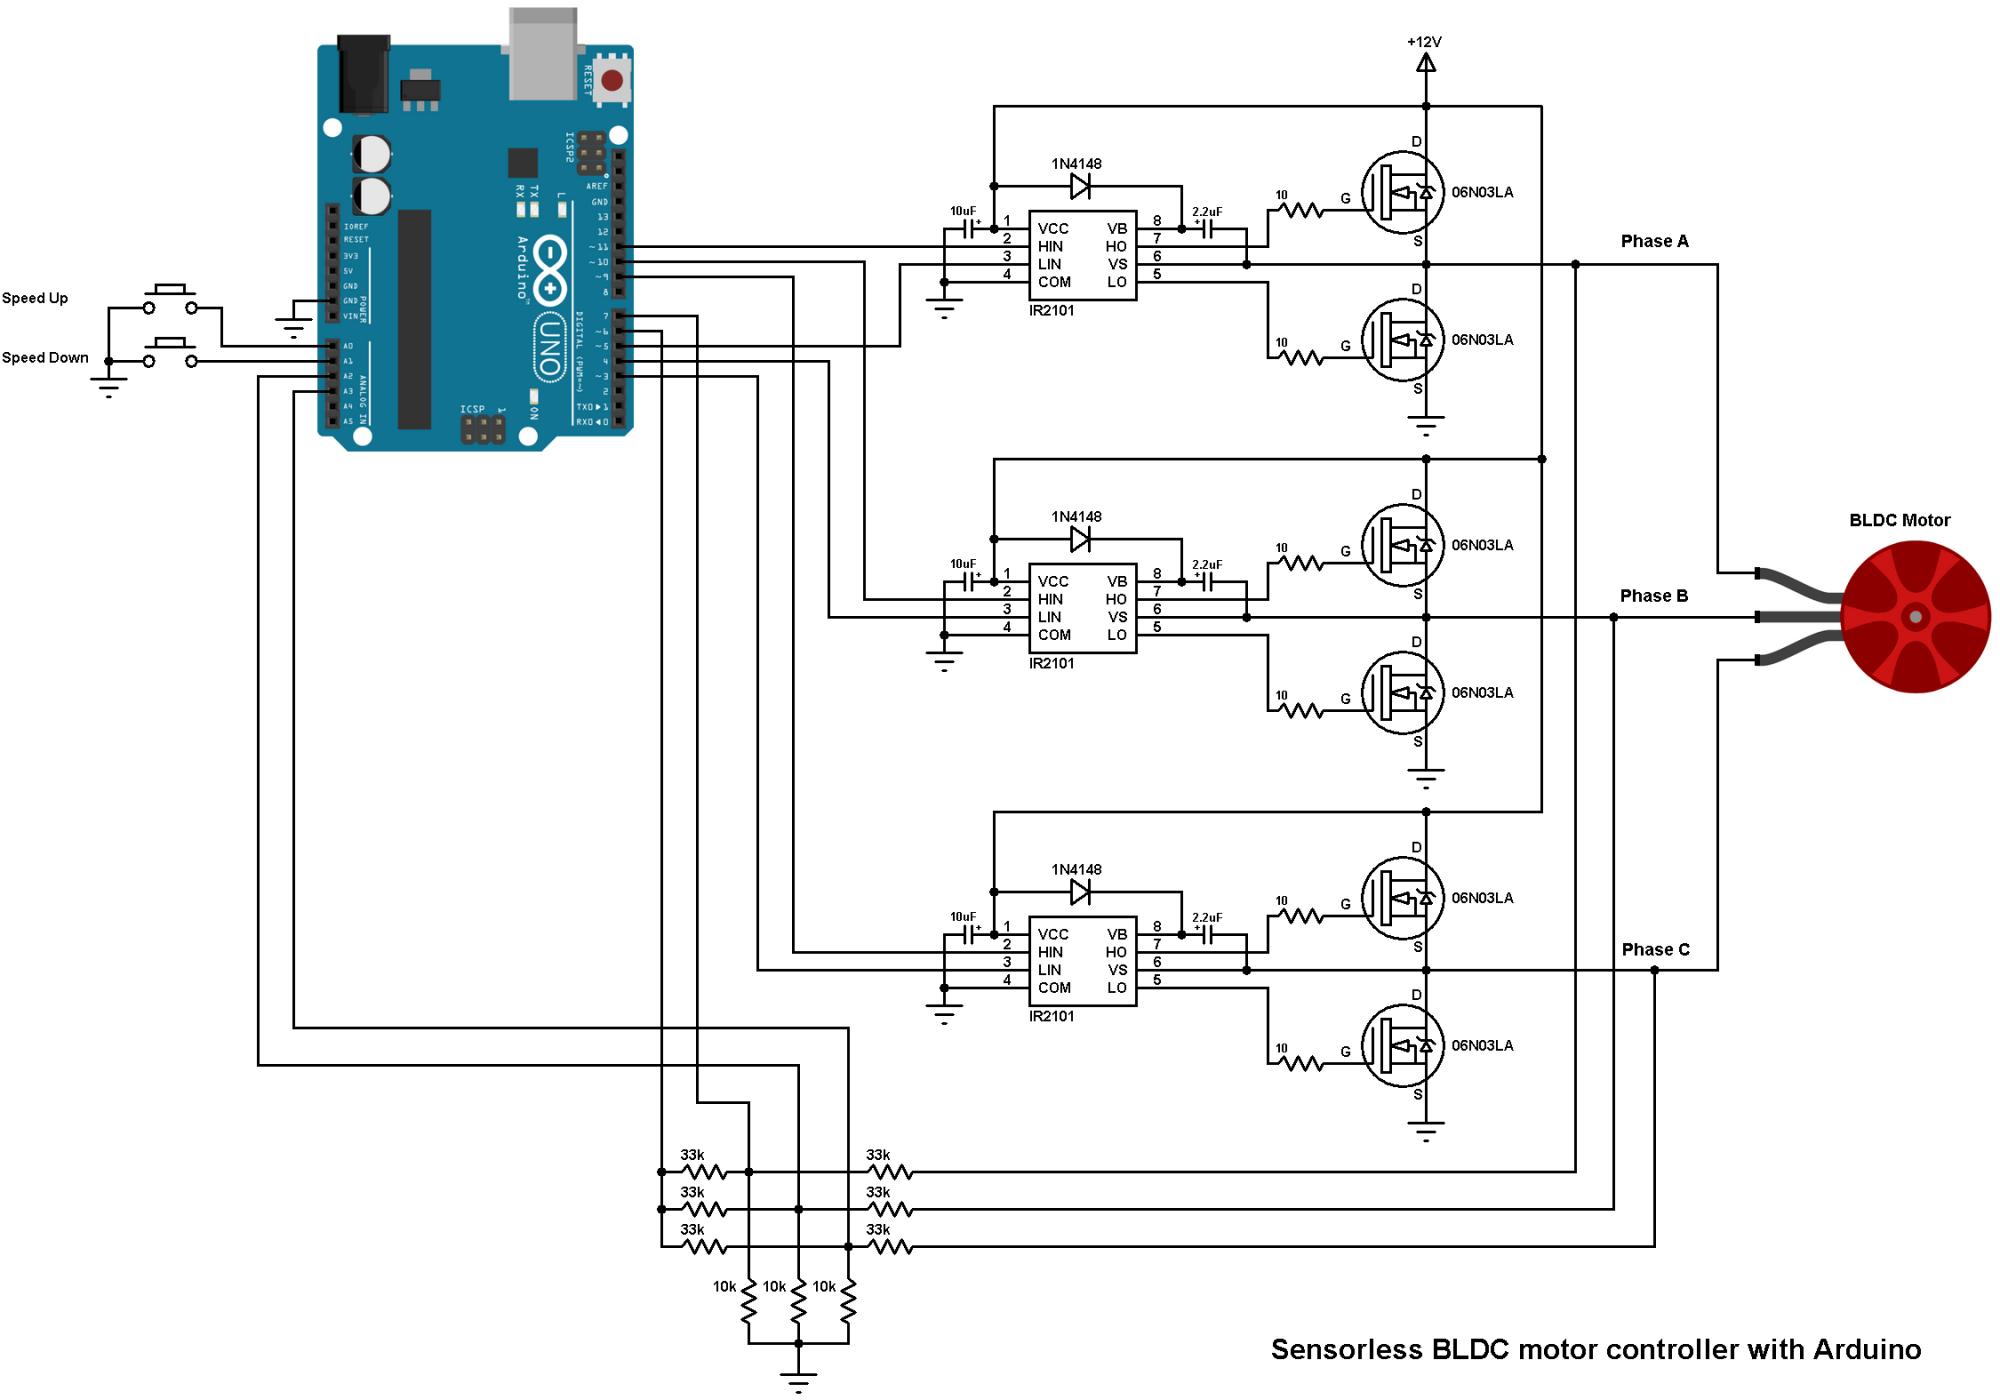 hight resolution of brushless dc motor wiring circuit motorcontrol controlcircuit mix brushless dc motor controller using arduino and ir2101